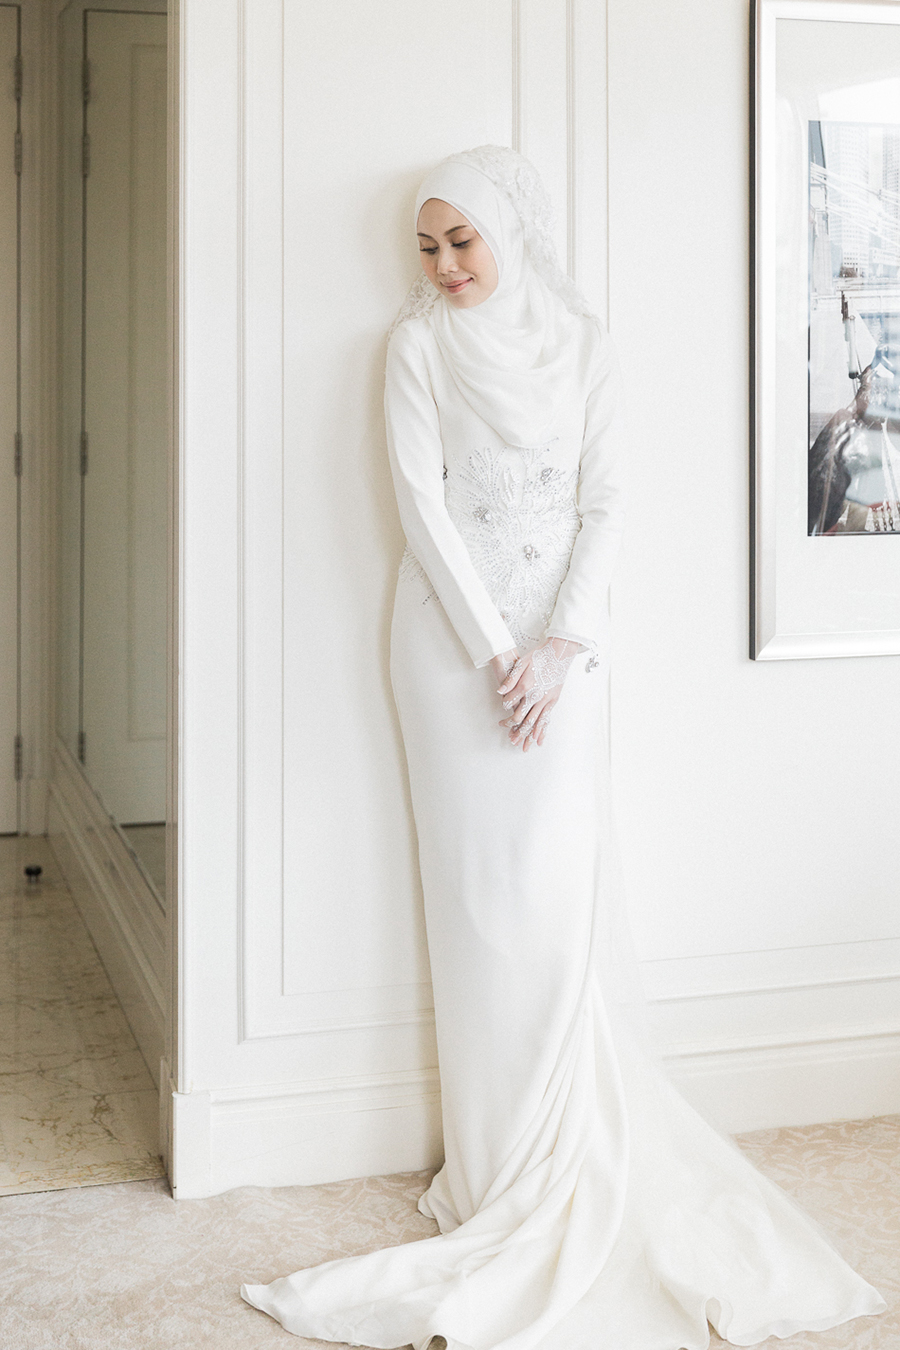 Chen_Sands_Photo_Destination_Wedding_Photographer_StRegis_Singapore-18.jpg